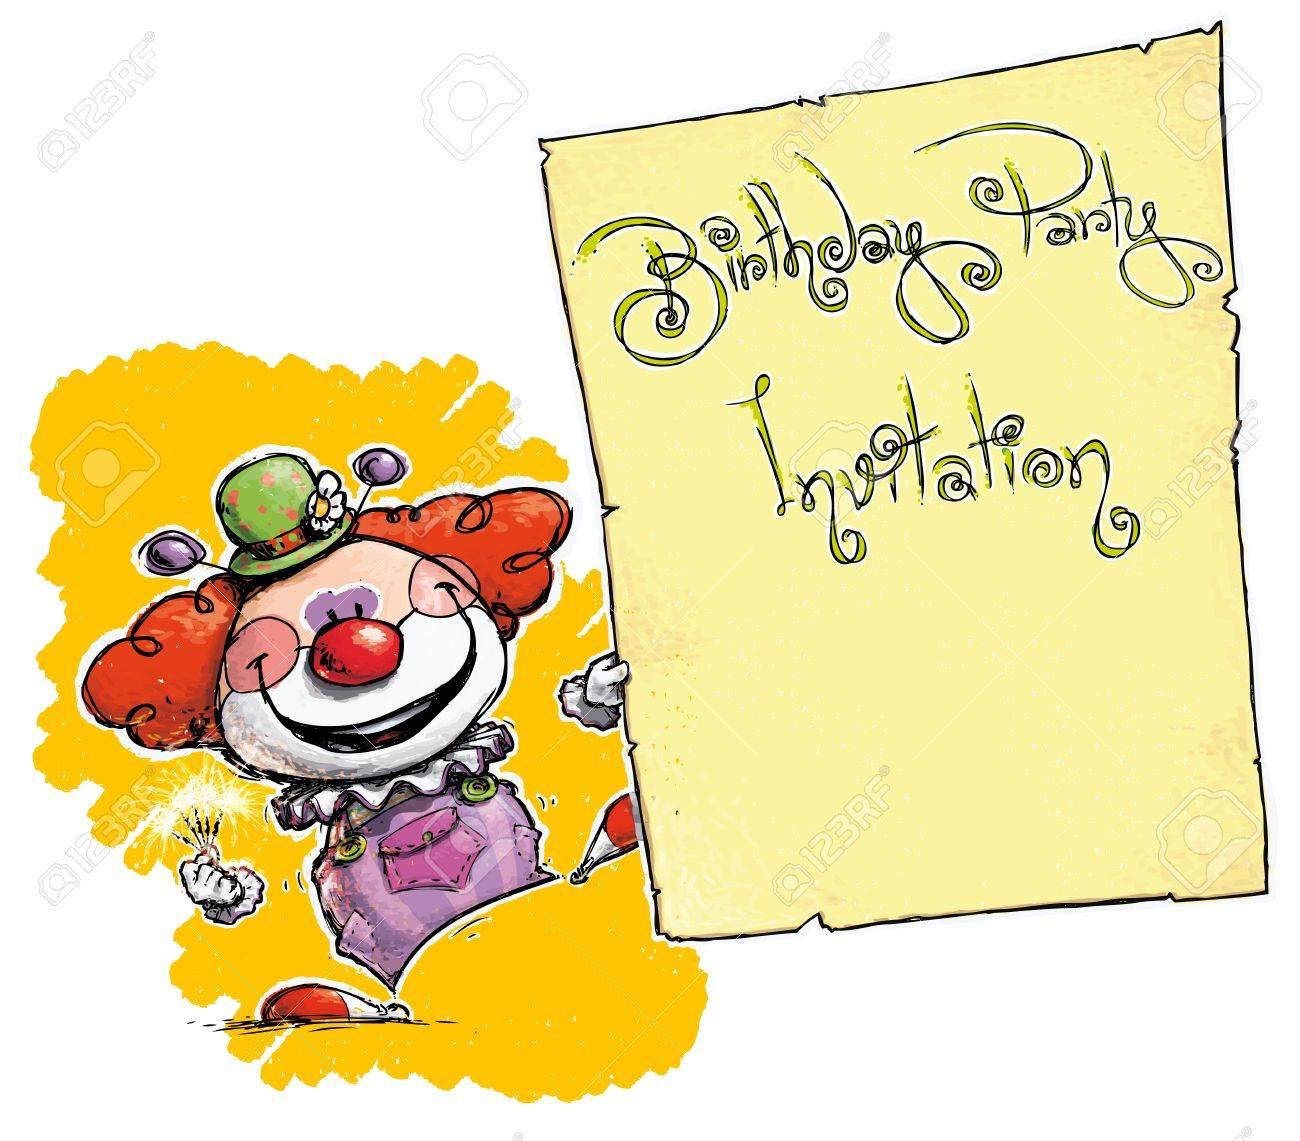 Cartoon/Artistic illustration of a Clown a Birthday Party Invitation Stock Vector - 21934989